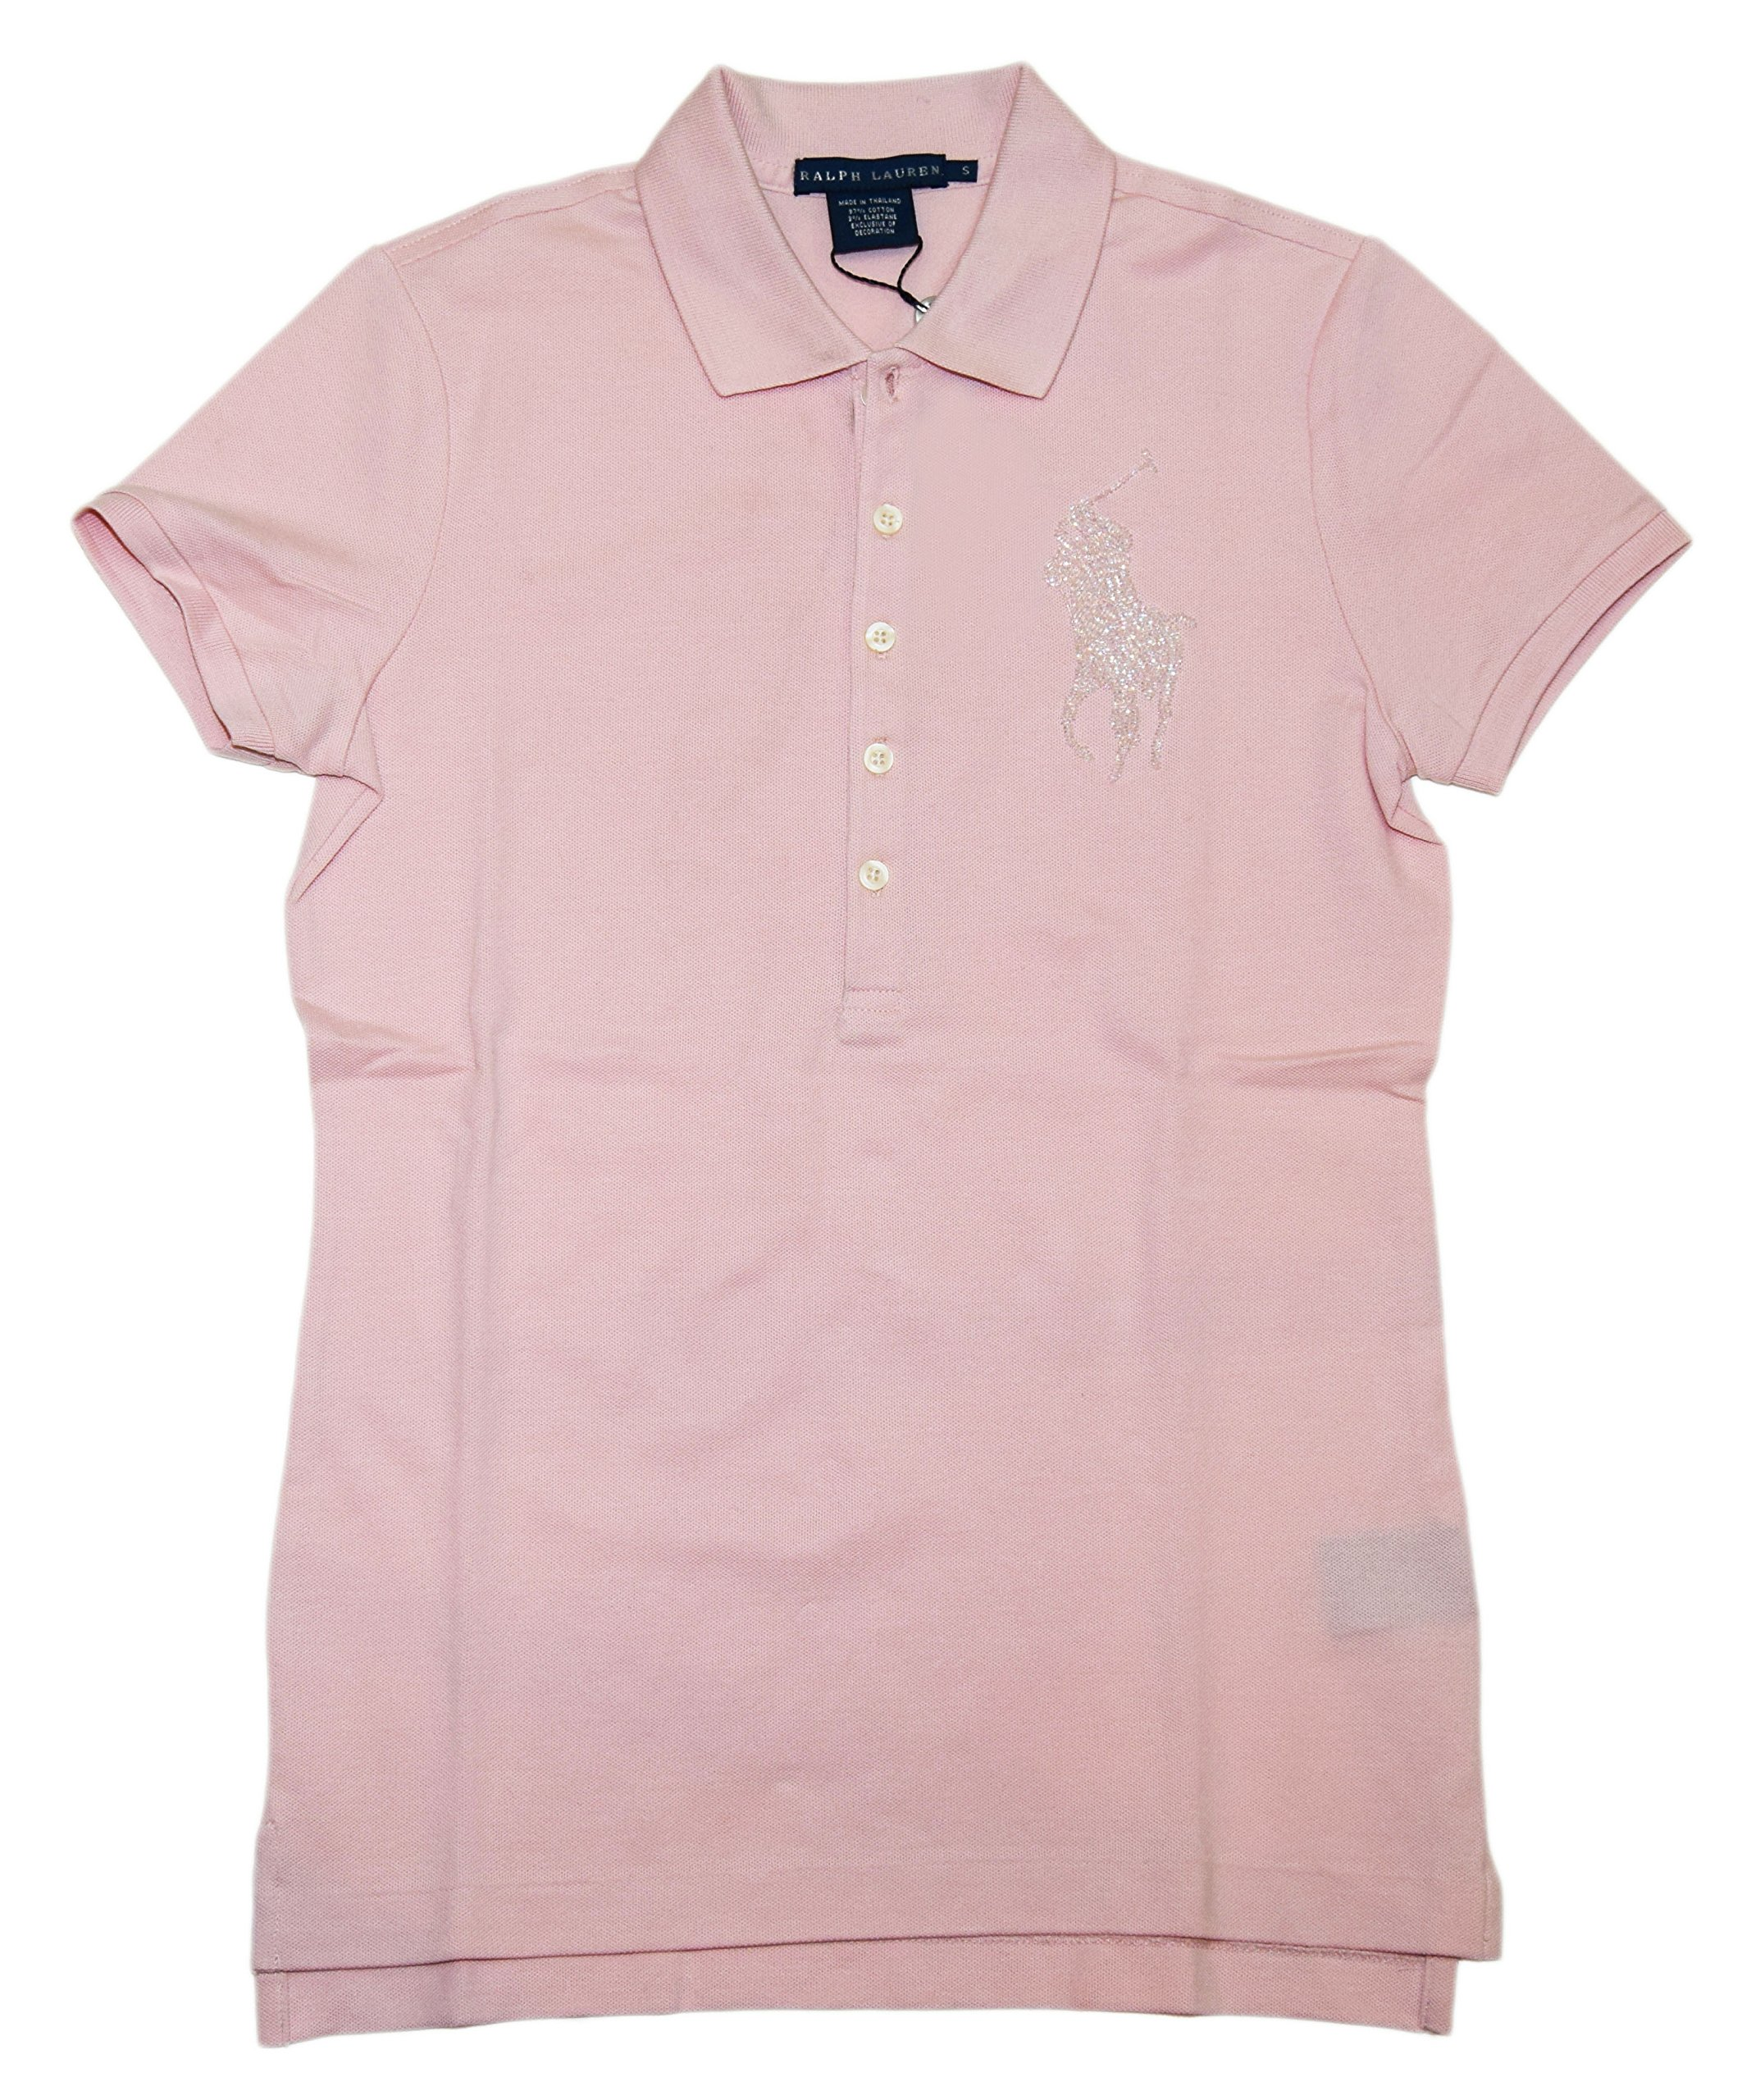 Polo Ralph Lauren Womens Big Pony Beaded Short Sleeve Mesh Shirt Pink Medium